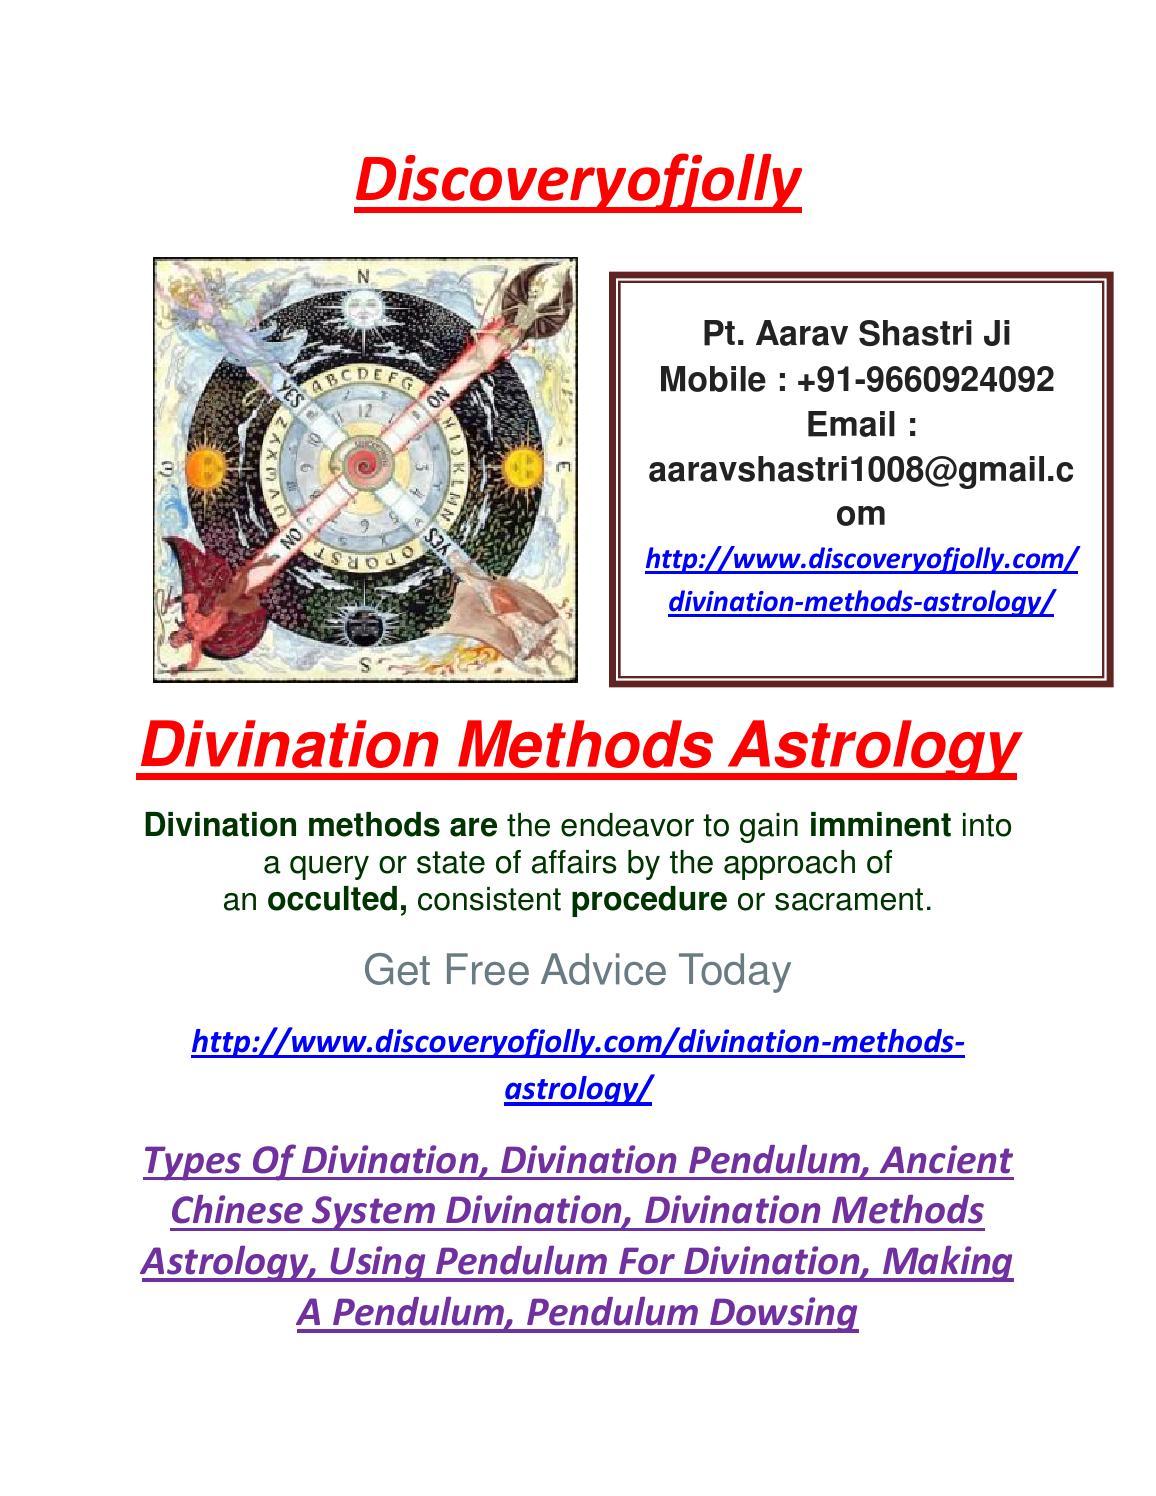 Divination Methods Astrology, 9660924092 by Rahini Rajpoot